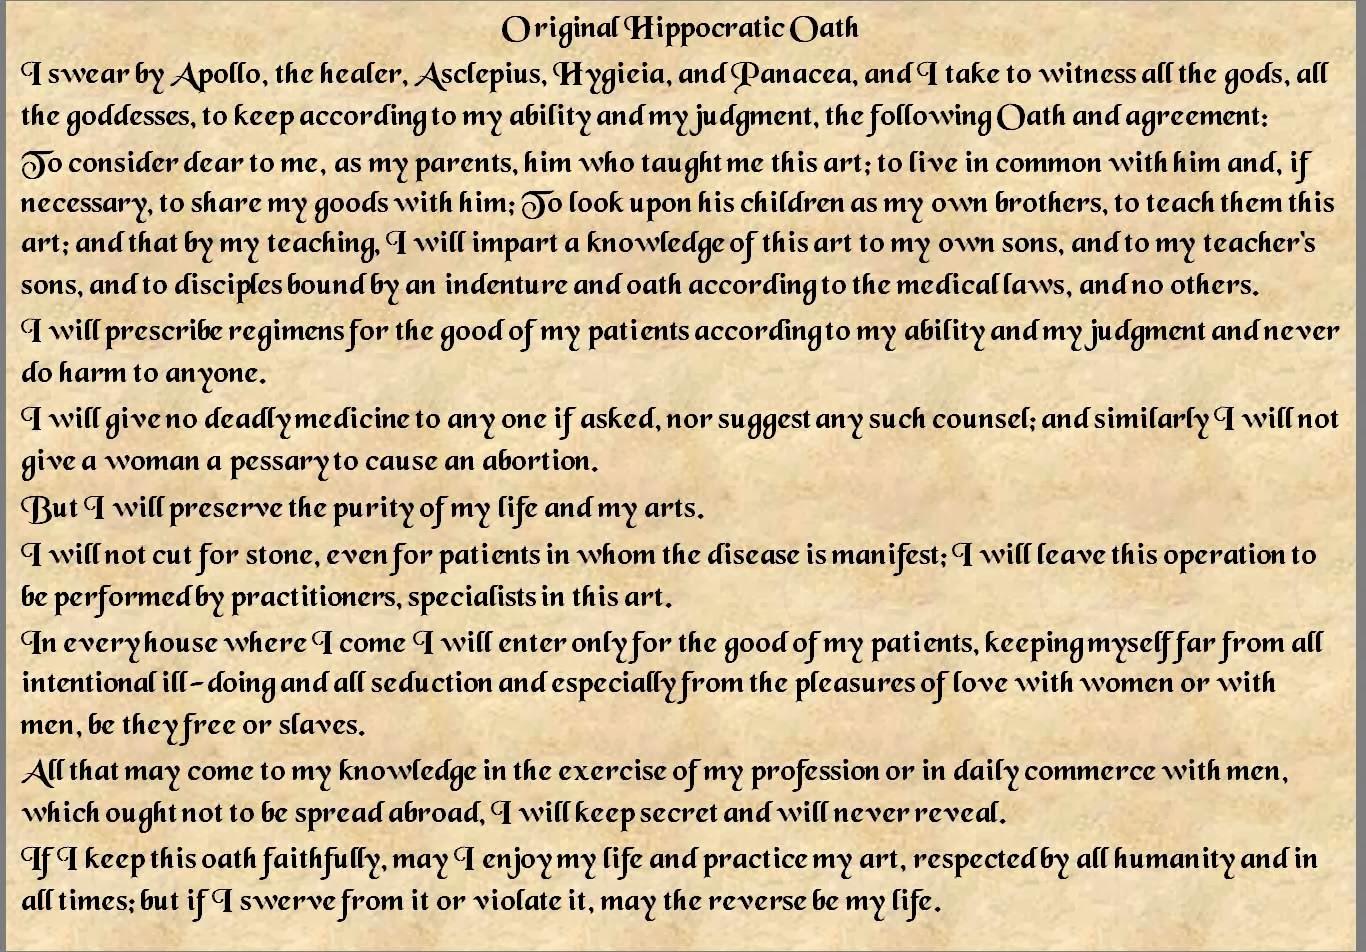 doctors hippocratic oath and euthanasia